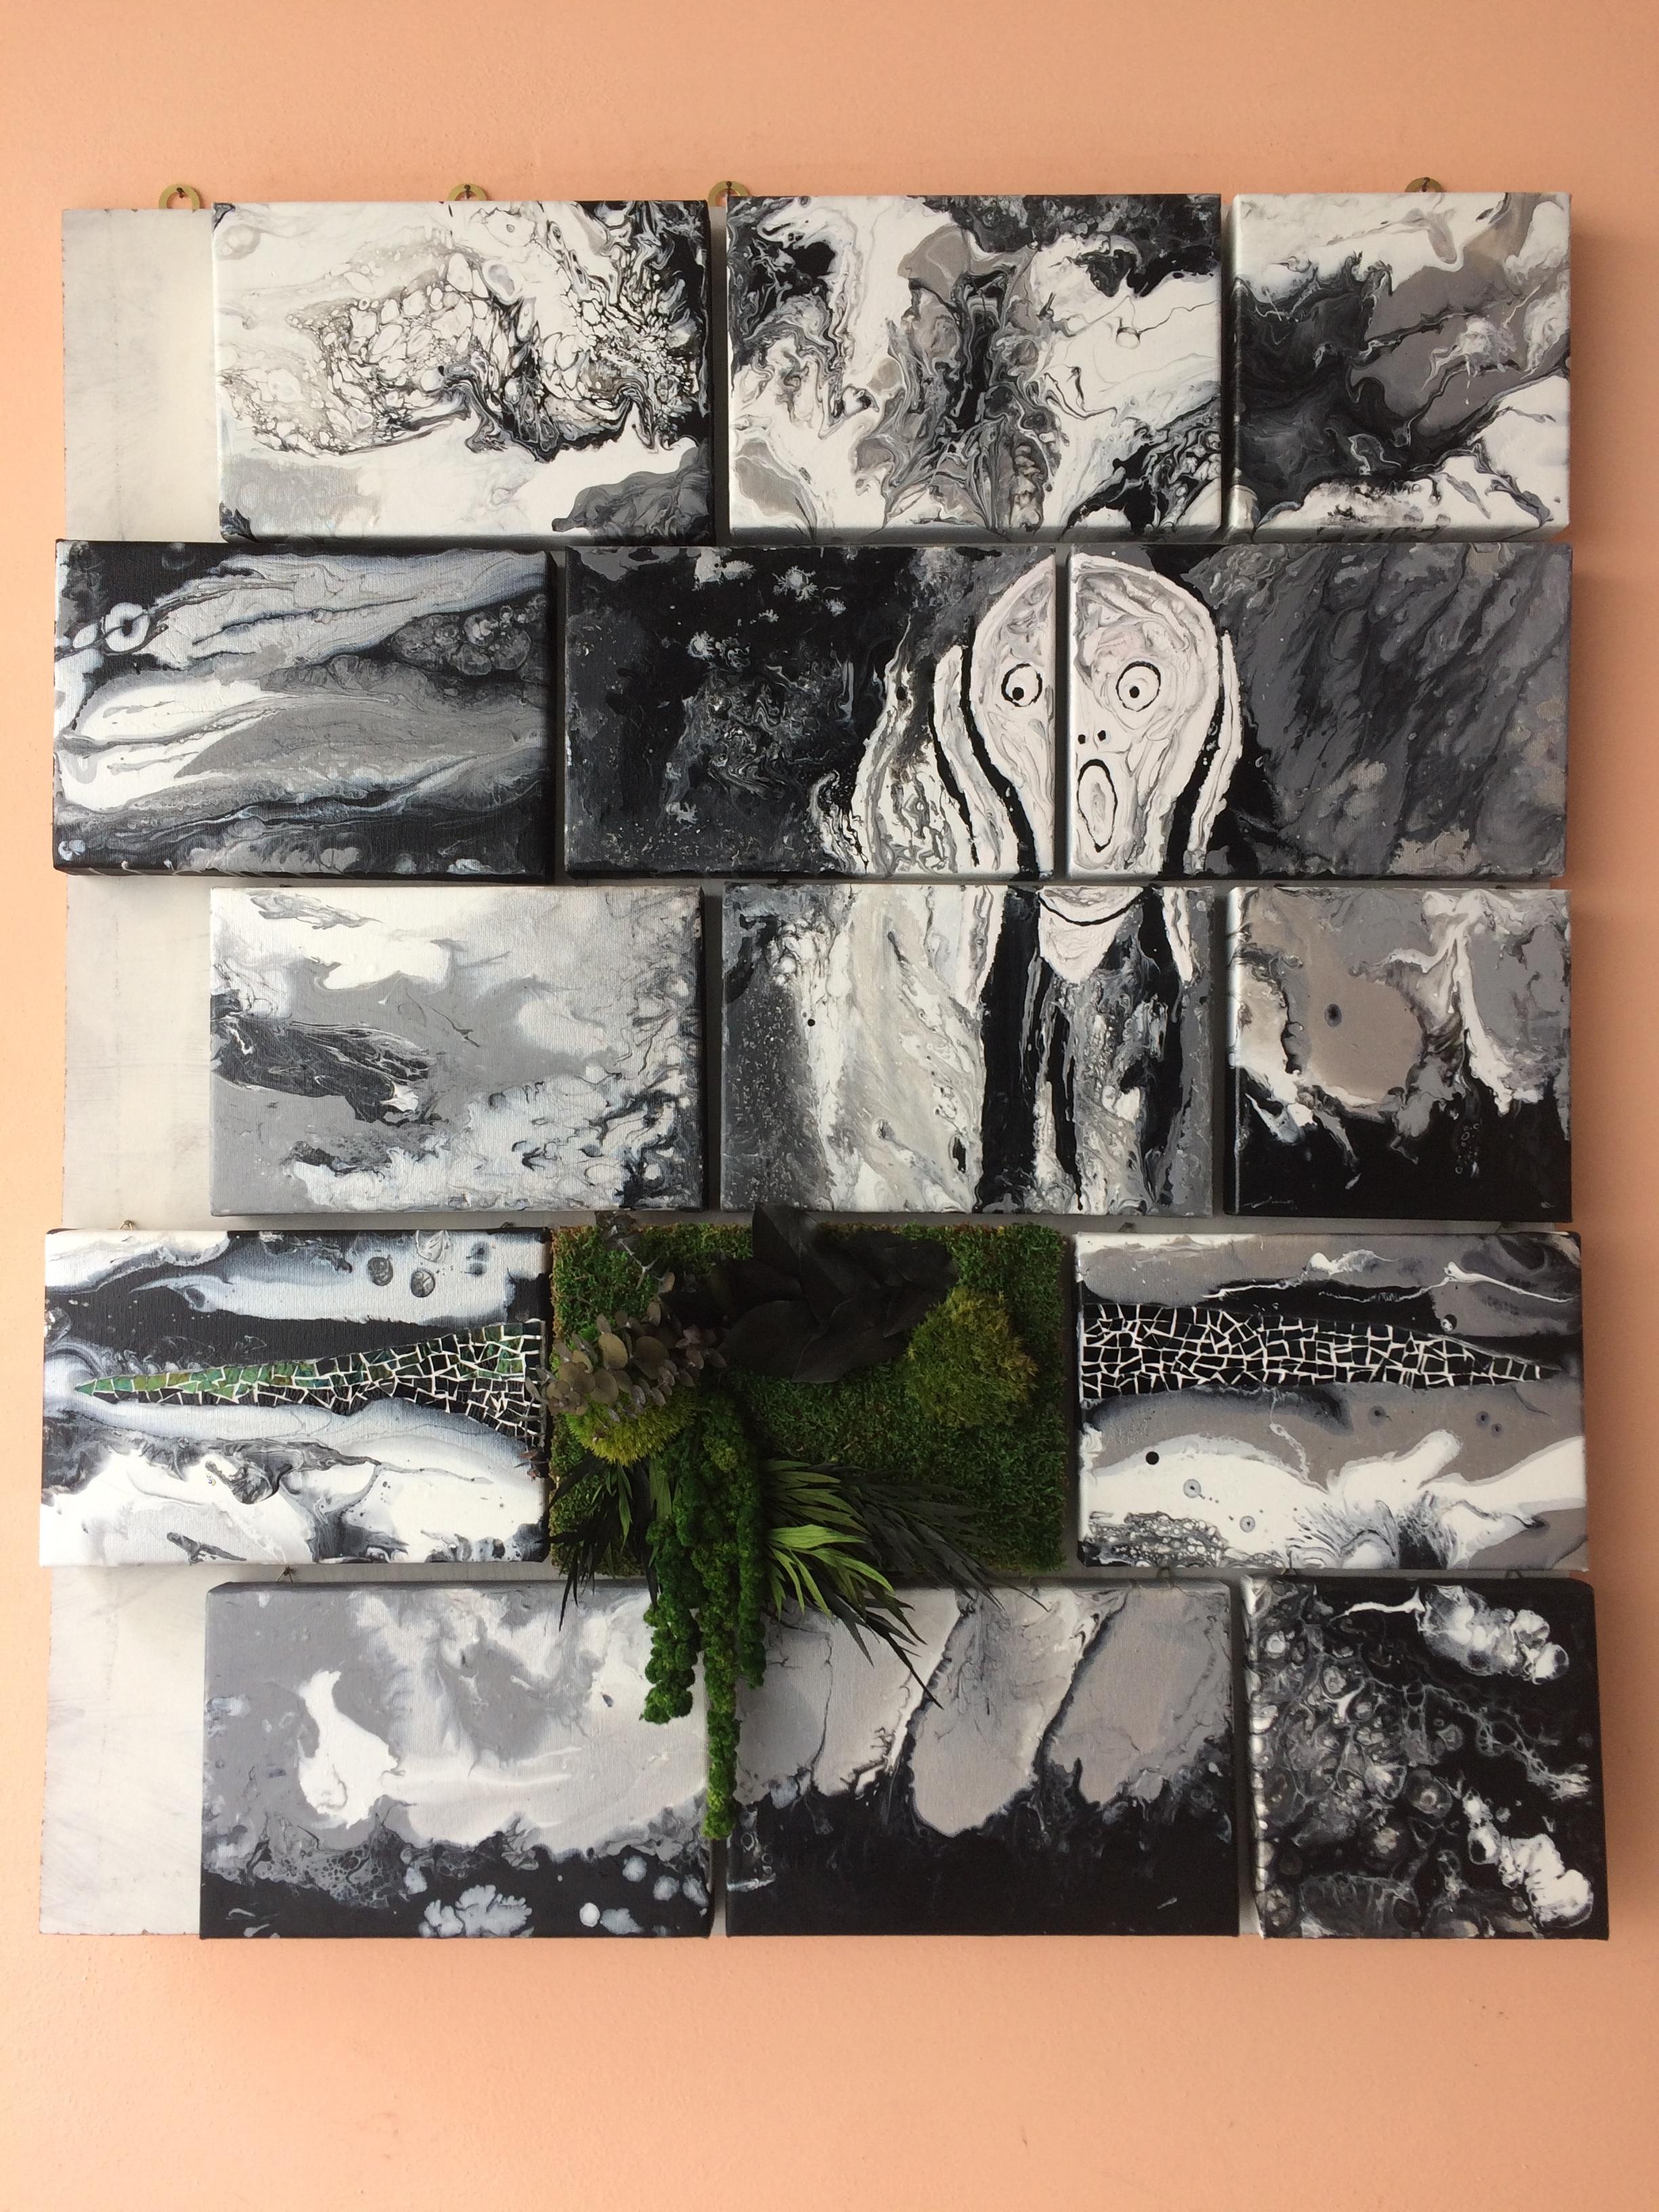 TheWall-installazione-DanielaMusone-Sounvasart